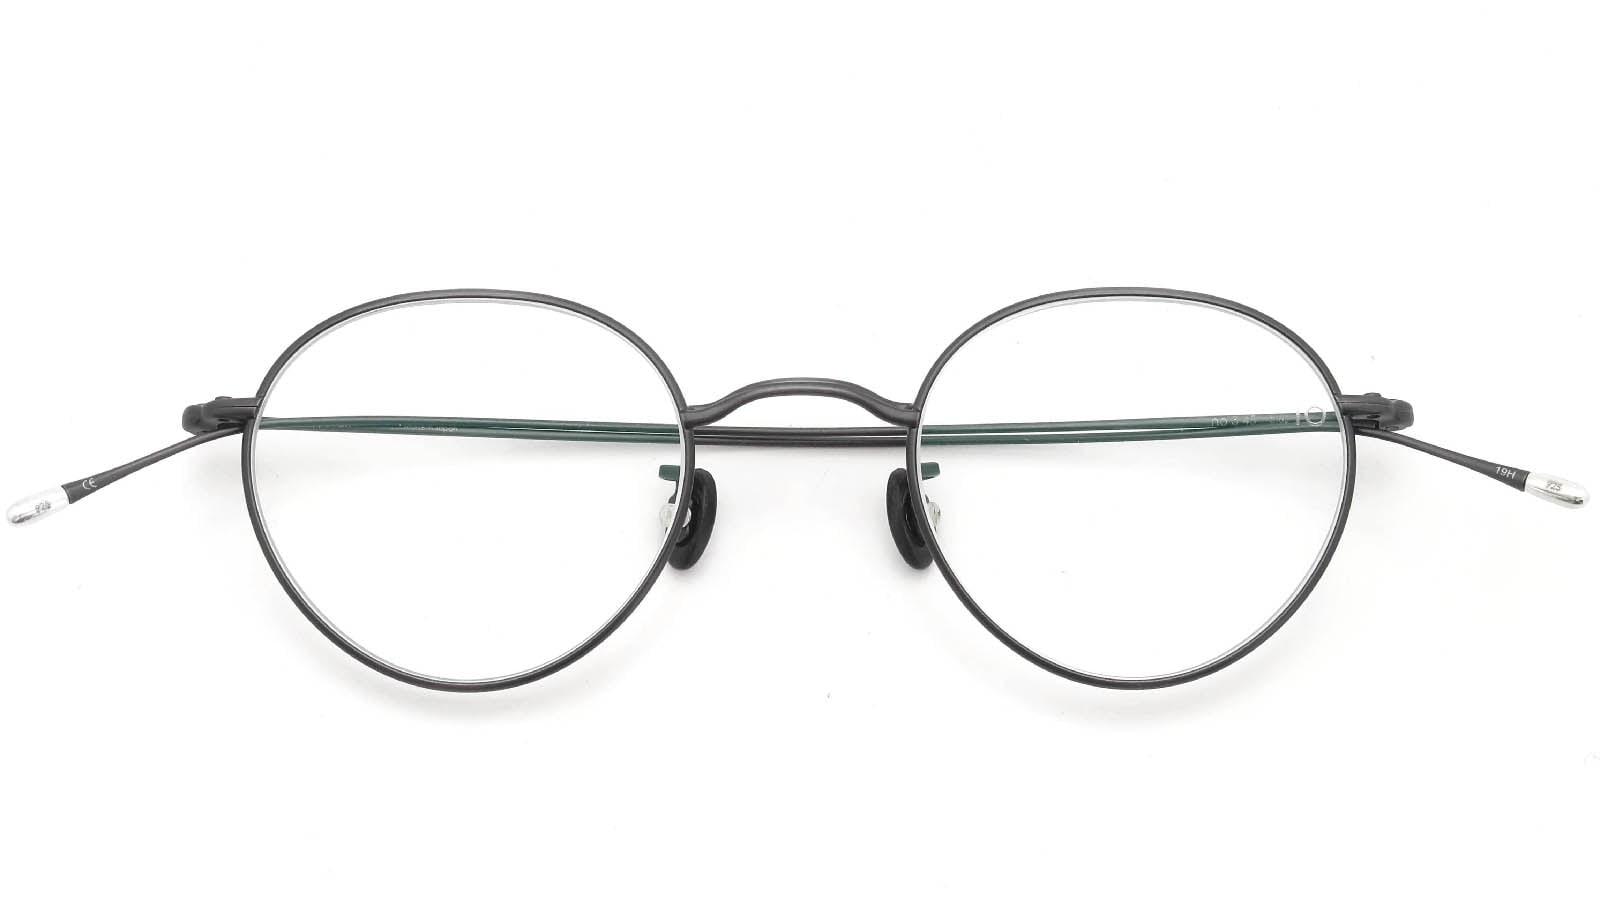 10 eyevan NO.3 45size 8S-CL MatCharcoal 折り畳み詳細